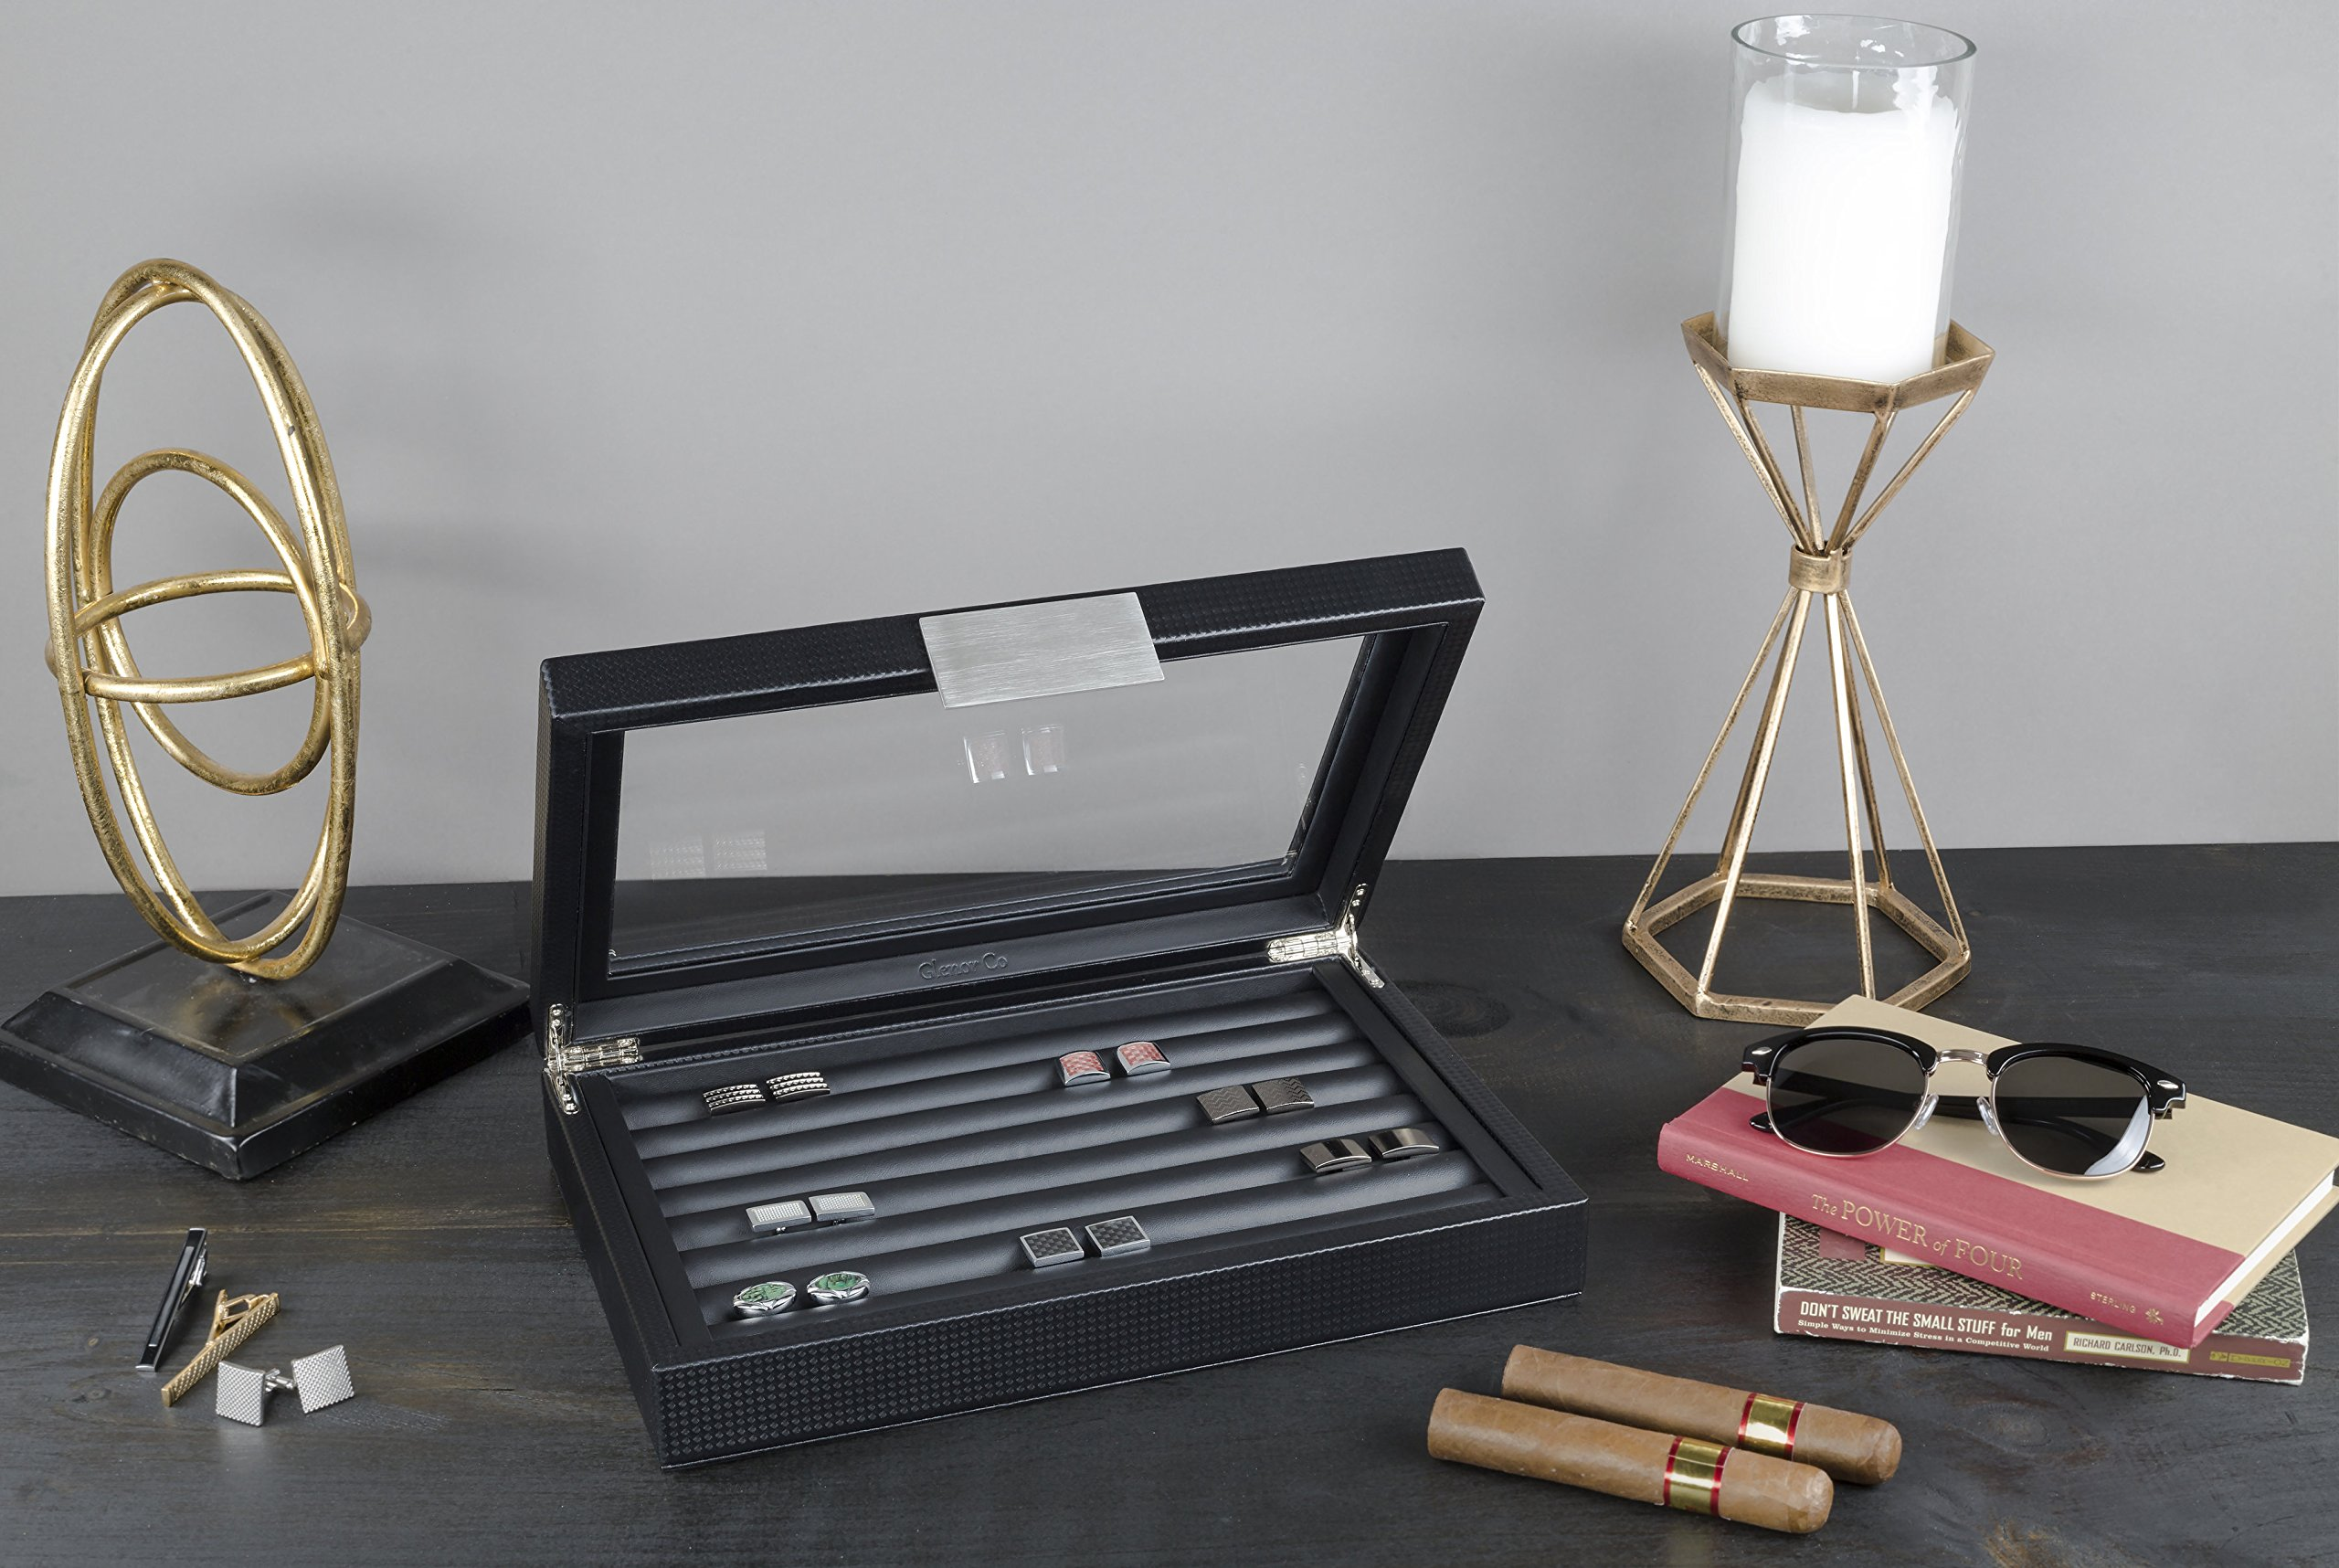 Glenor Co Cufflink Box for Men - Holds 70 Cufflinks - Luxury Display Jewelry Case -Carbon Fiber Design - Metal Buckle Holder, Large Glass Top - Black by Glenor Co (Image #2)